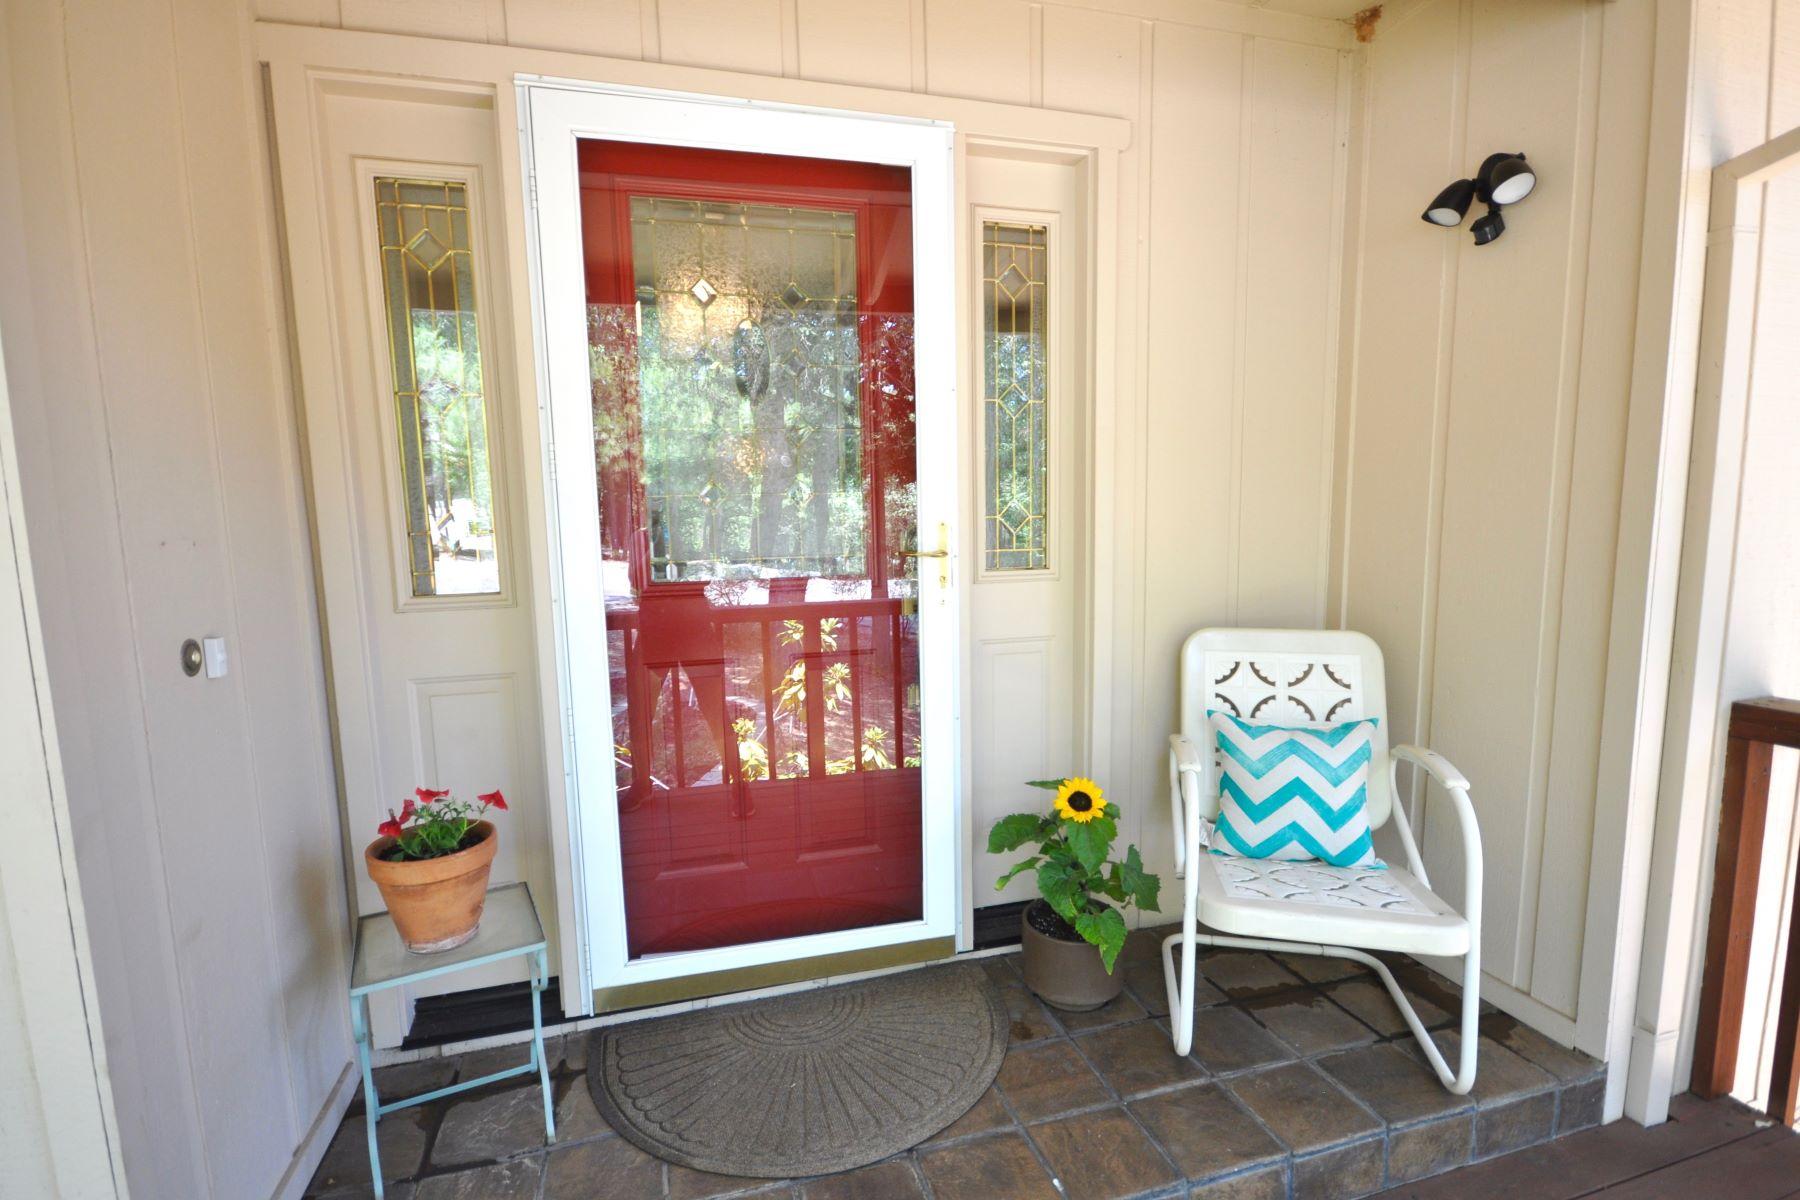 واحد منزل الأسرة للـ Sale في Charming Home Nestled in the Pines 12502 Arrow Head Pine Grove, California 95665 United States